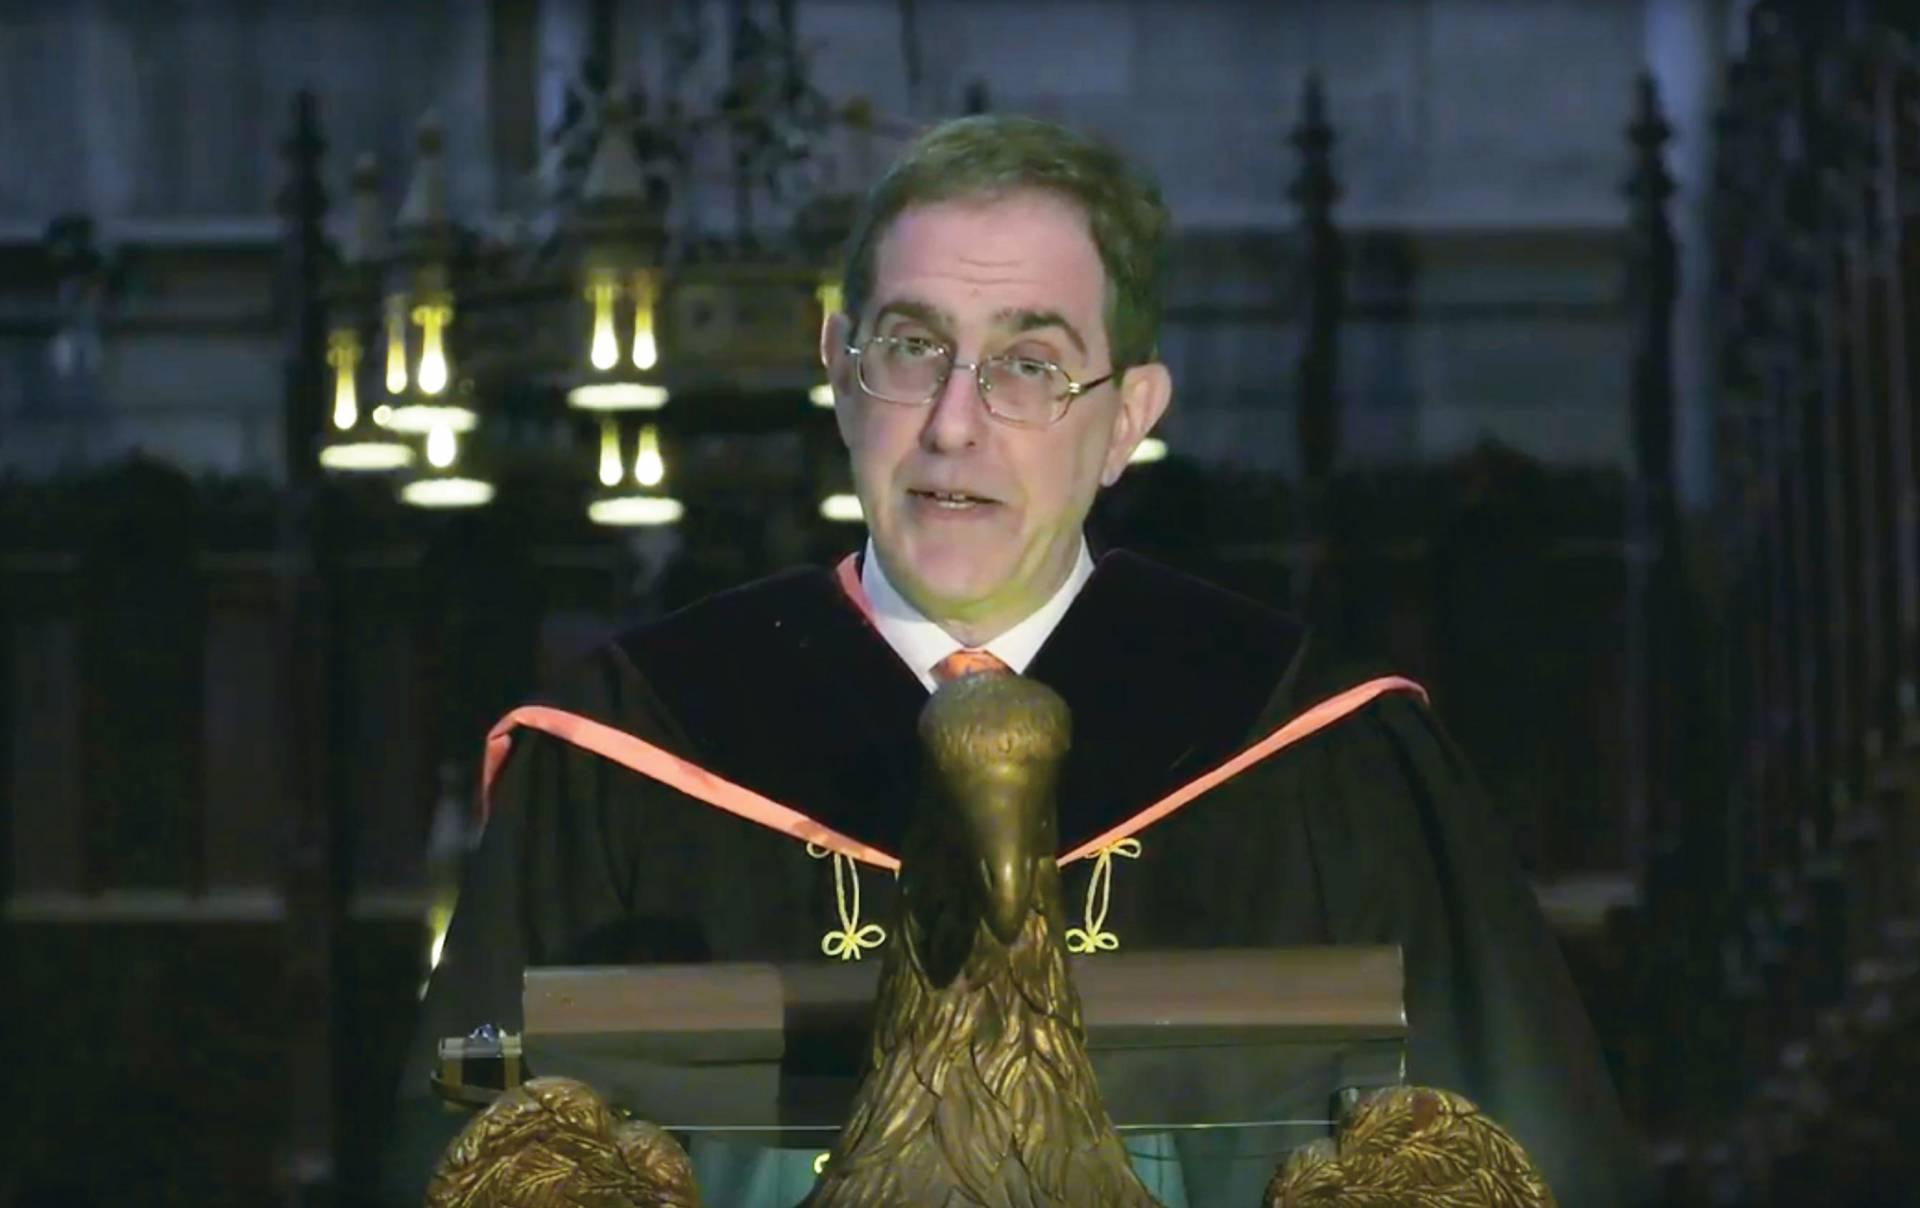 Christopher Eisgruber delivering Baccalaureate address